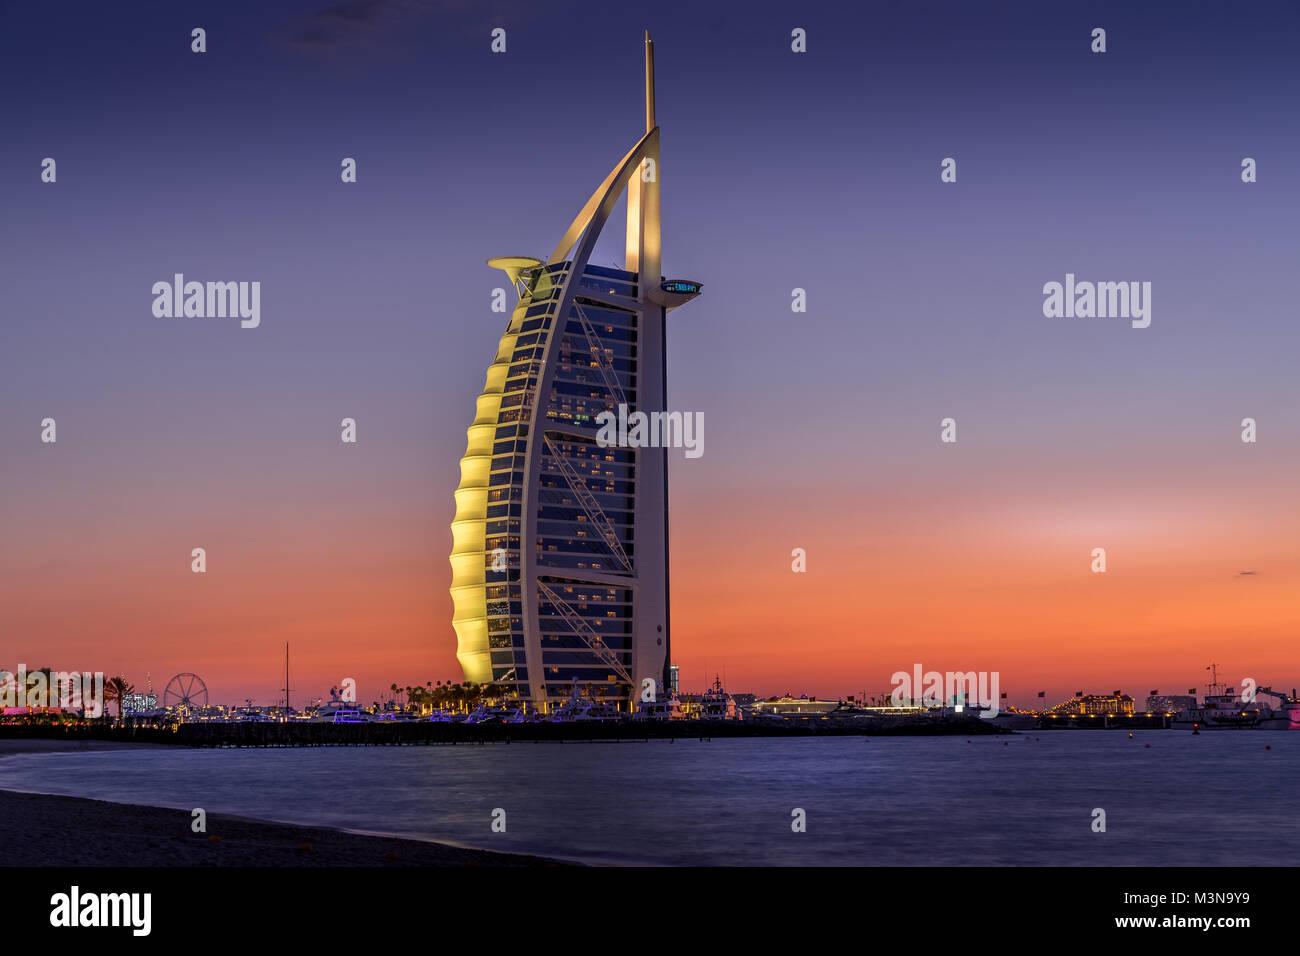 Dubai, United Arab Emirates - Jan 10, 2018. Sunset view of Burj Al Arab hotel on Jumeirah beach in Dubai, United - Stock Image